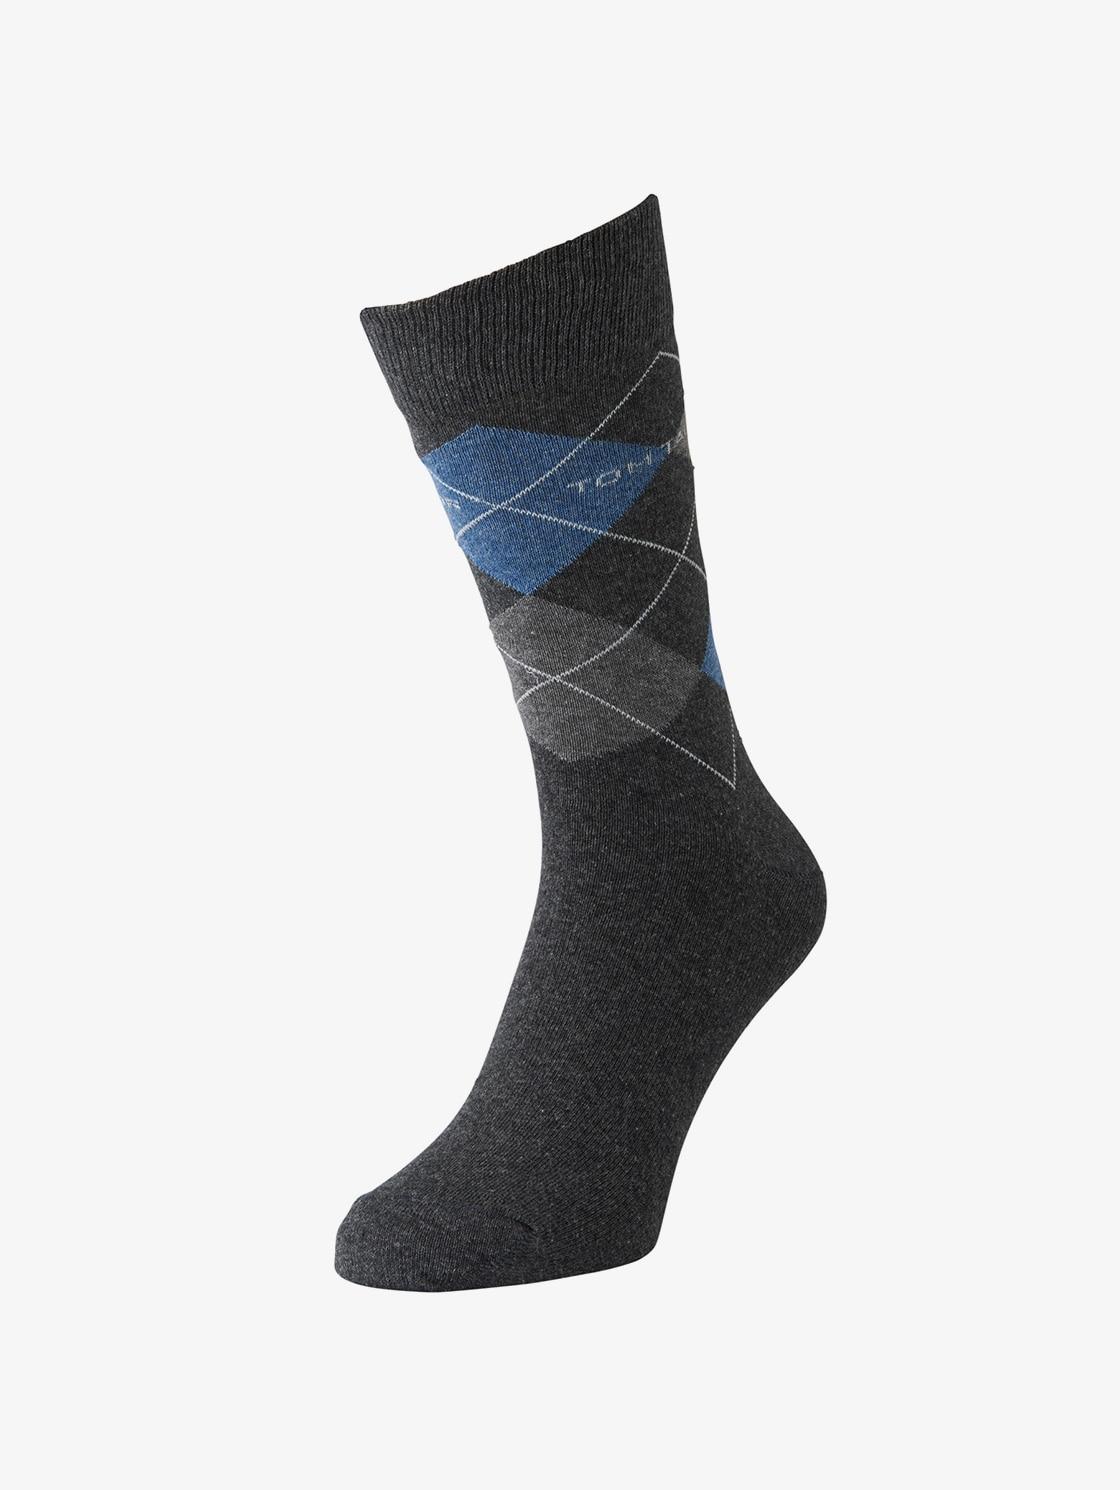 Tom Tailor Casual Socken im Doppel Pack, Herren, anthracite melange, Größe: 39 42